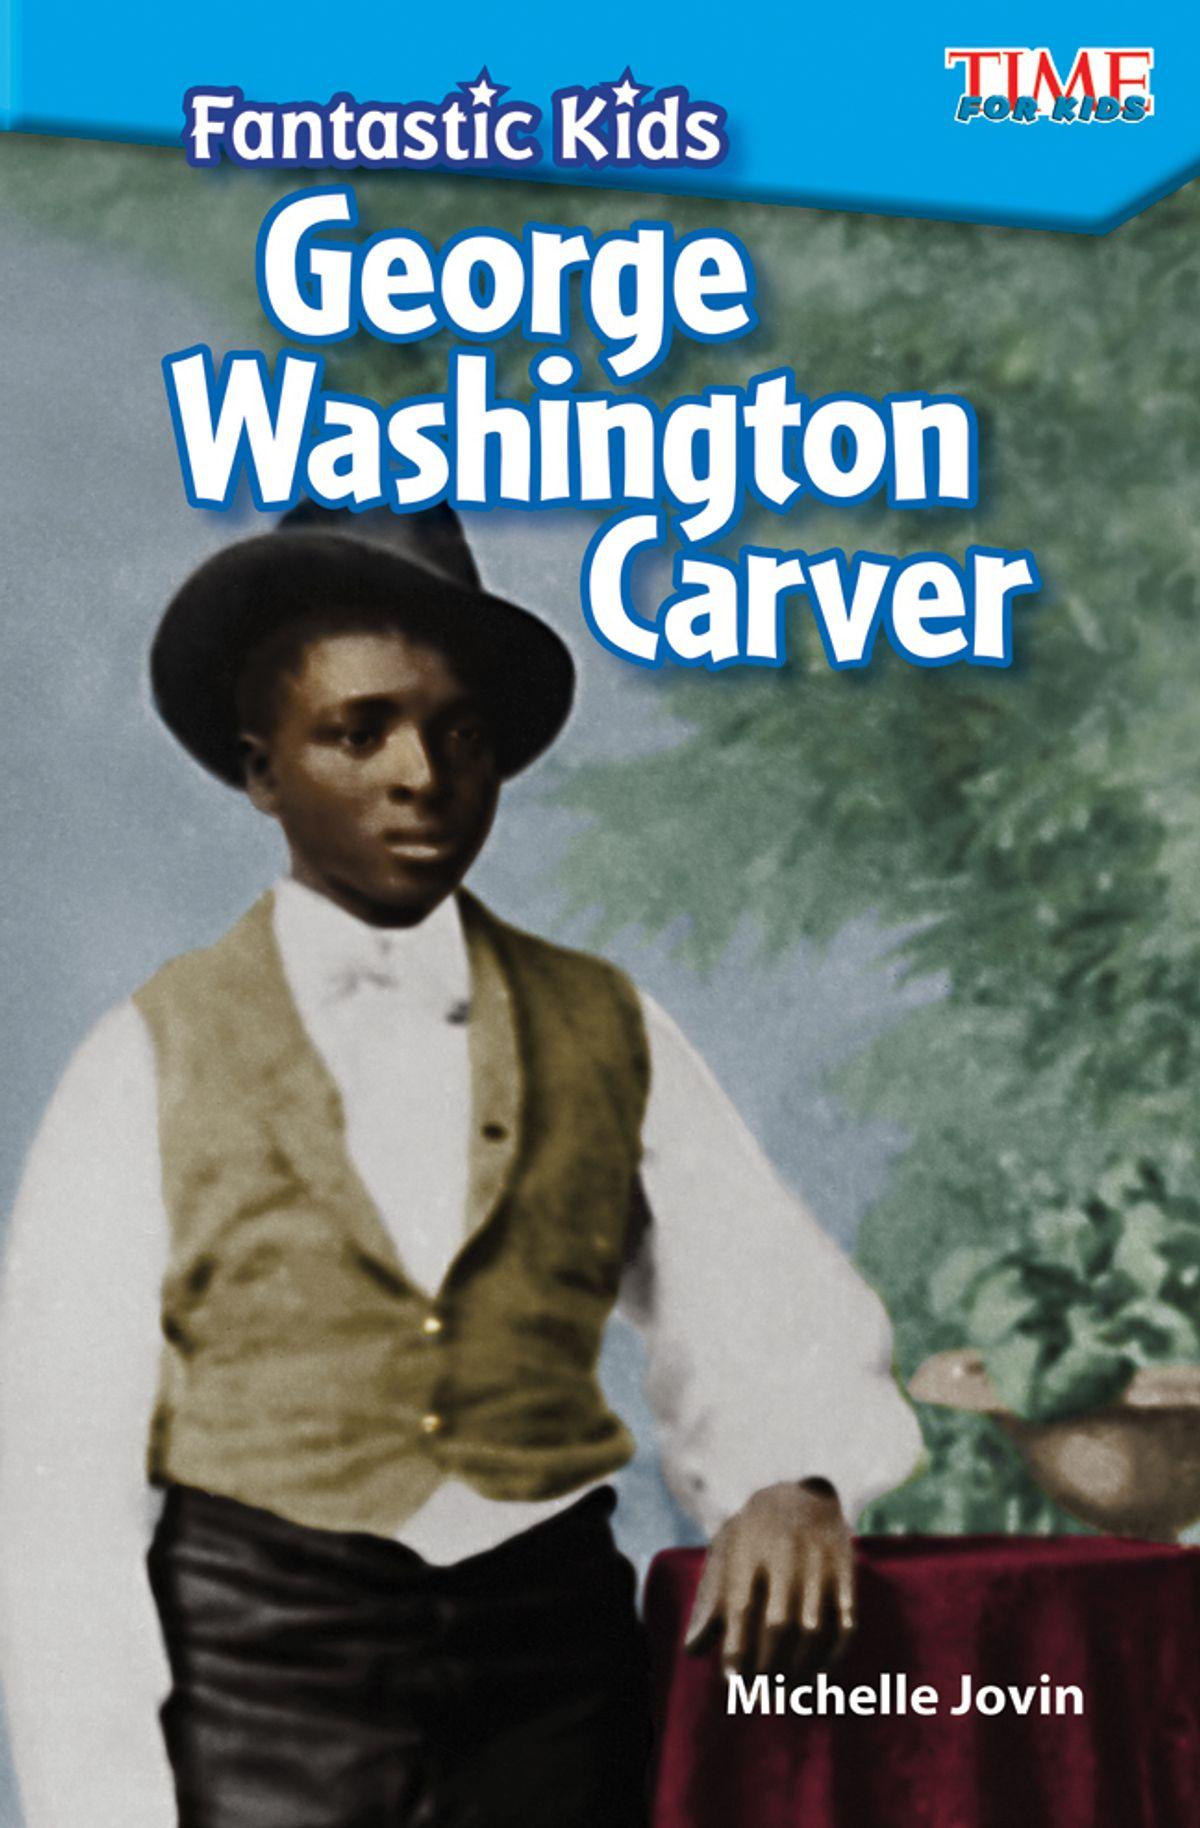 Fantastic Kids George Washington Carver